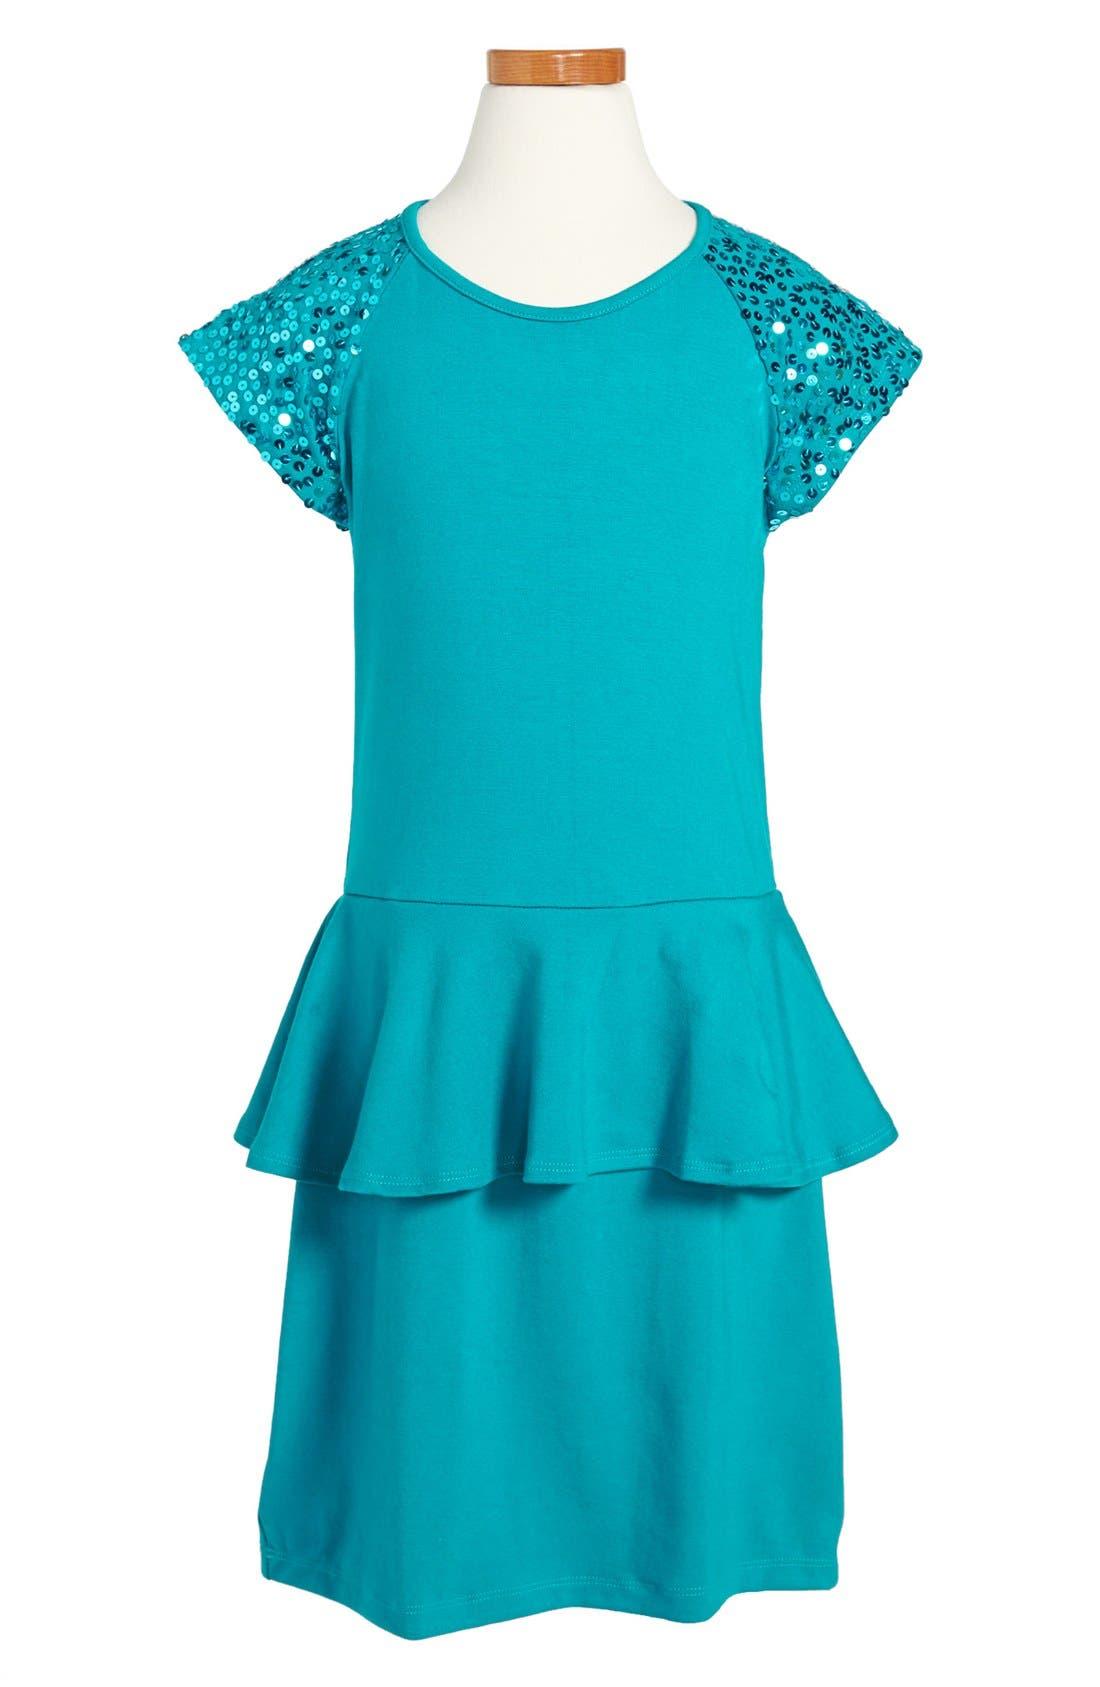 Alternate Image 1 Selected - Flowers by Zoe Sequin Sleeve Peplum Dress (Big Girls)